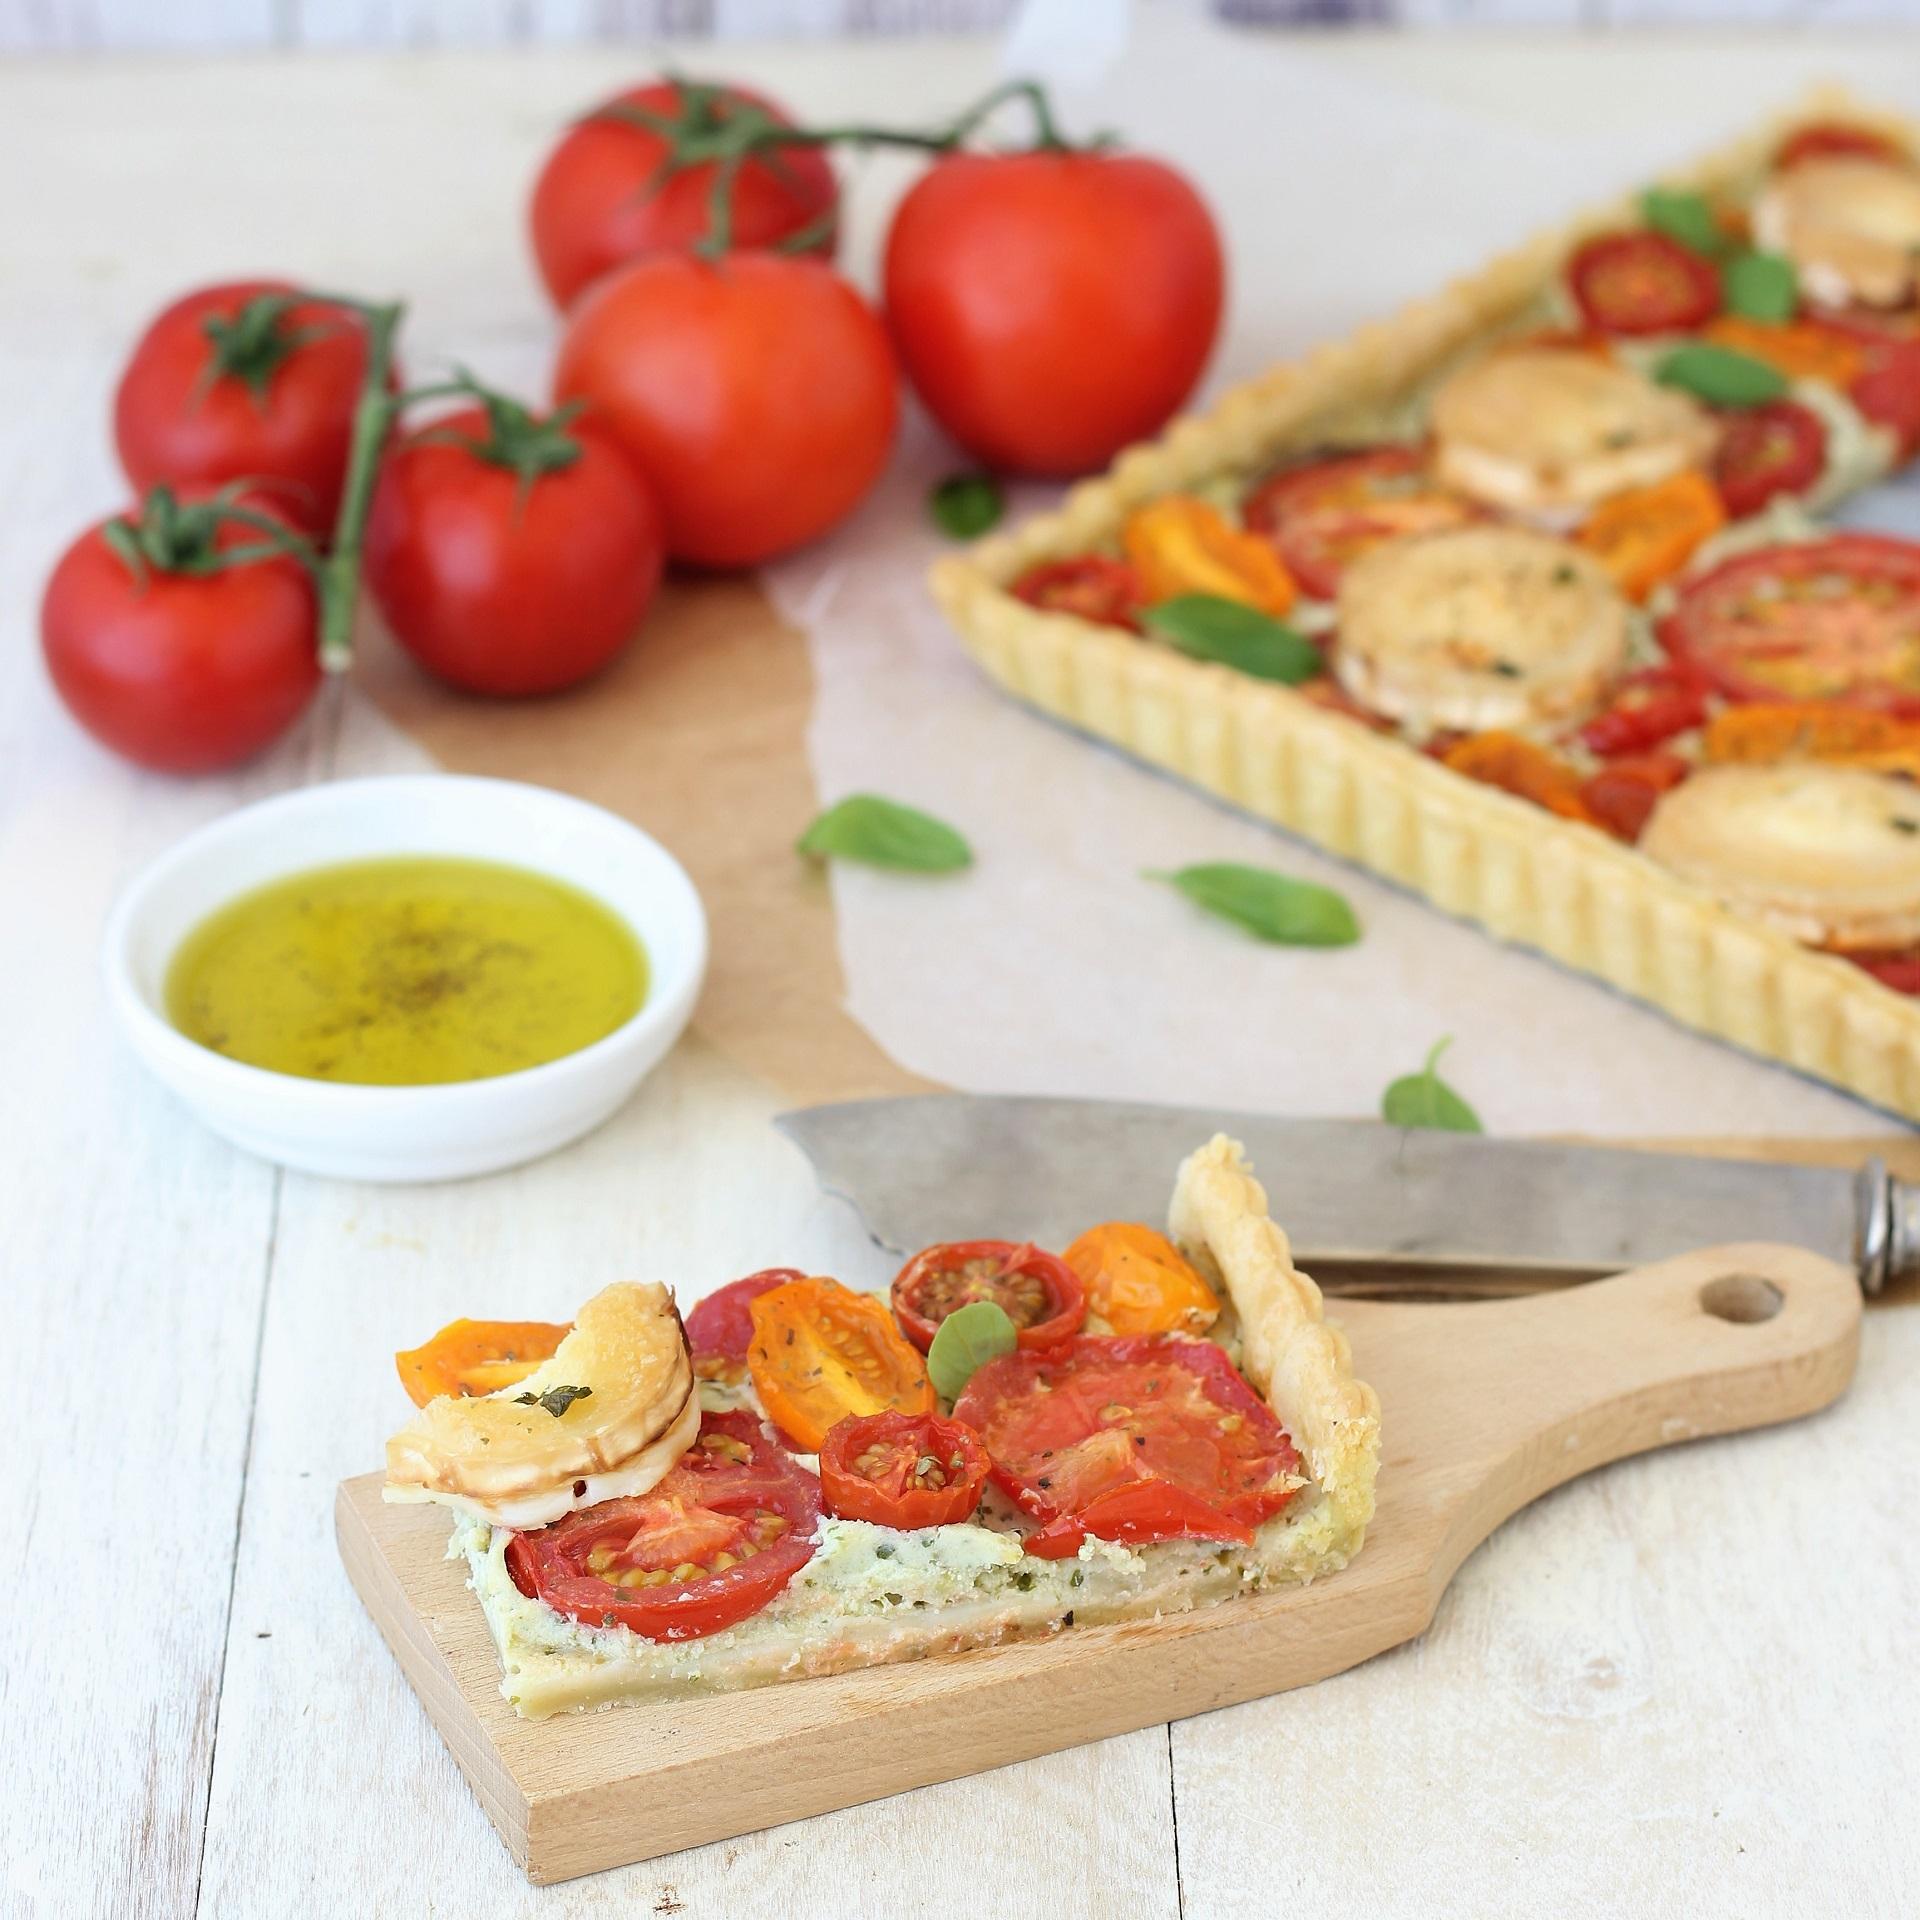 Torta salata con pomodori e ricotta